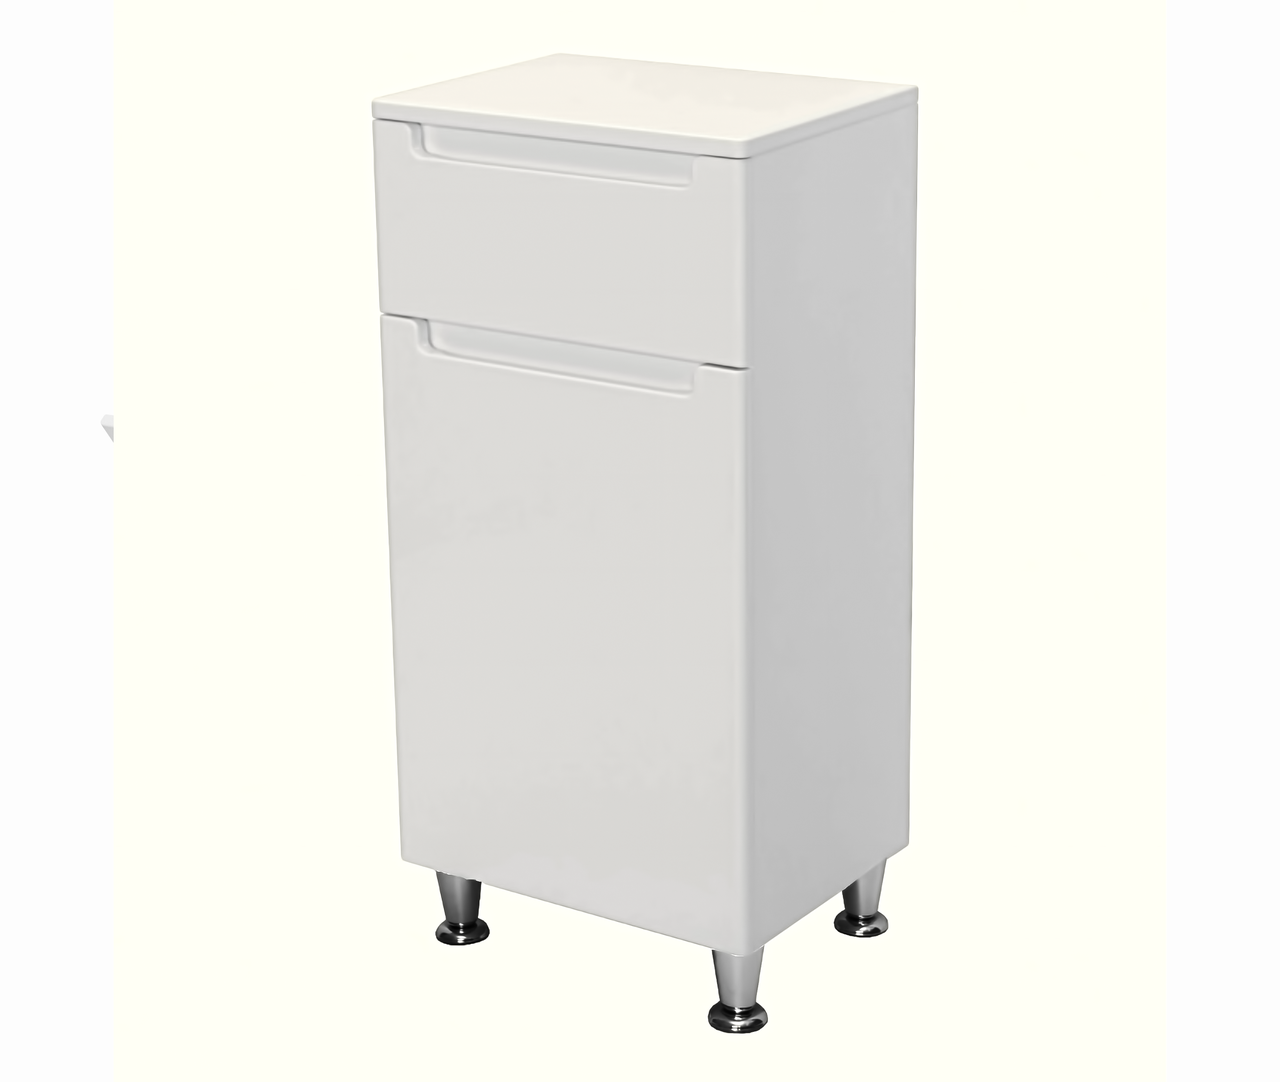 Комод для ванной комнаты Ельба ППН1ш-40 правий